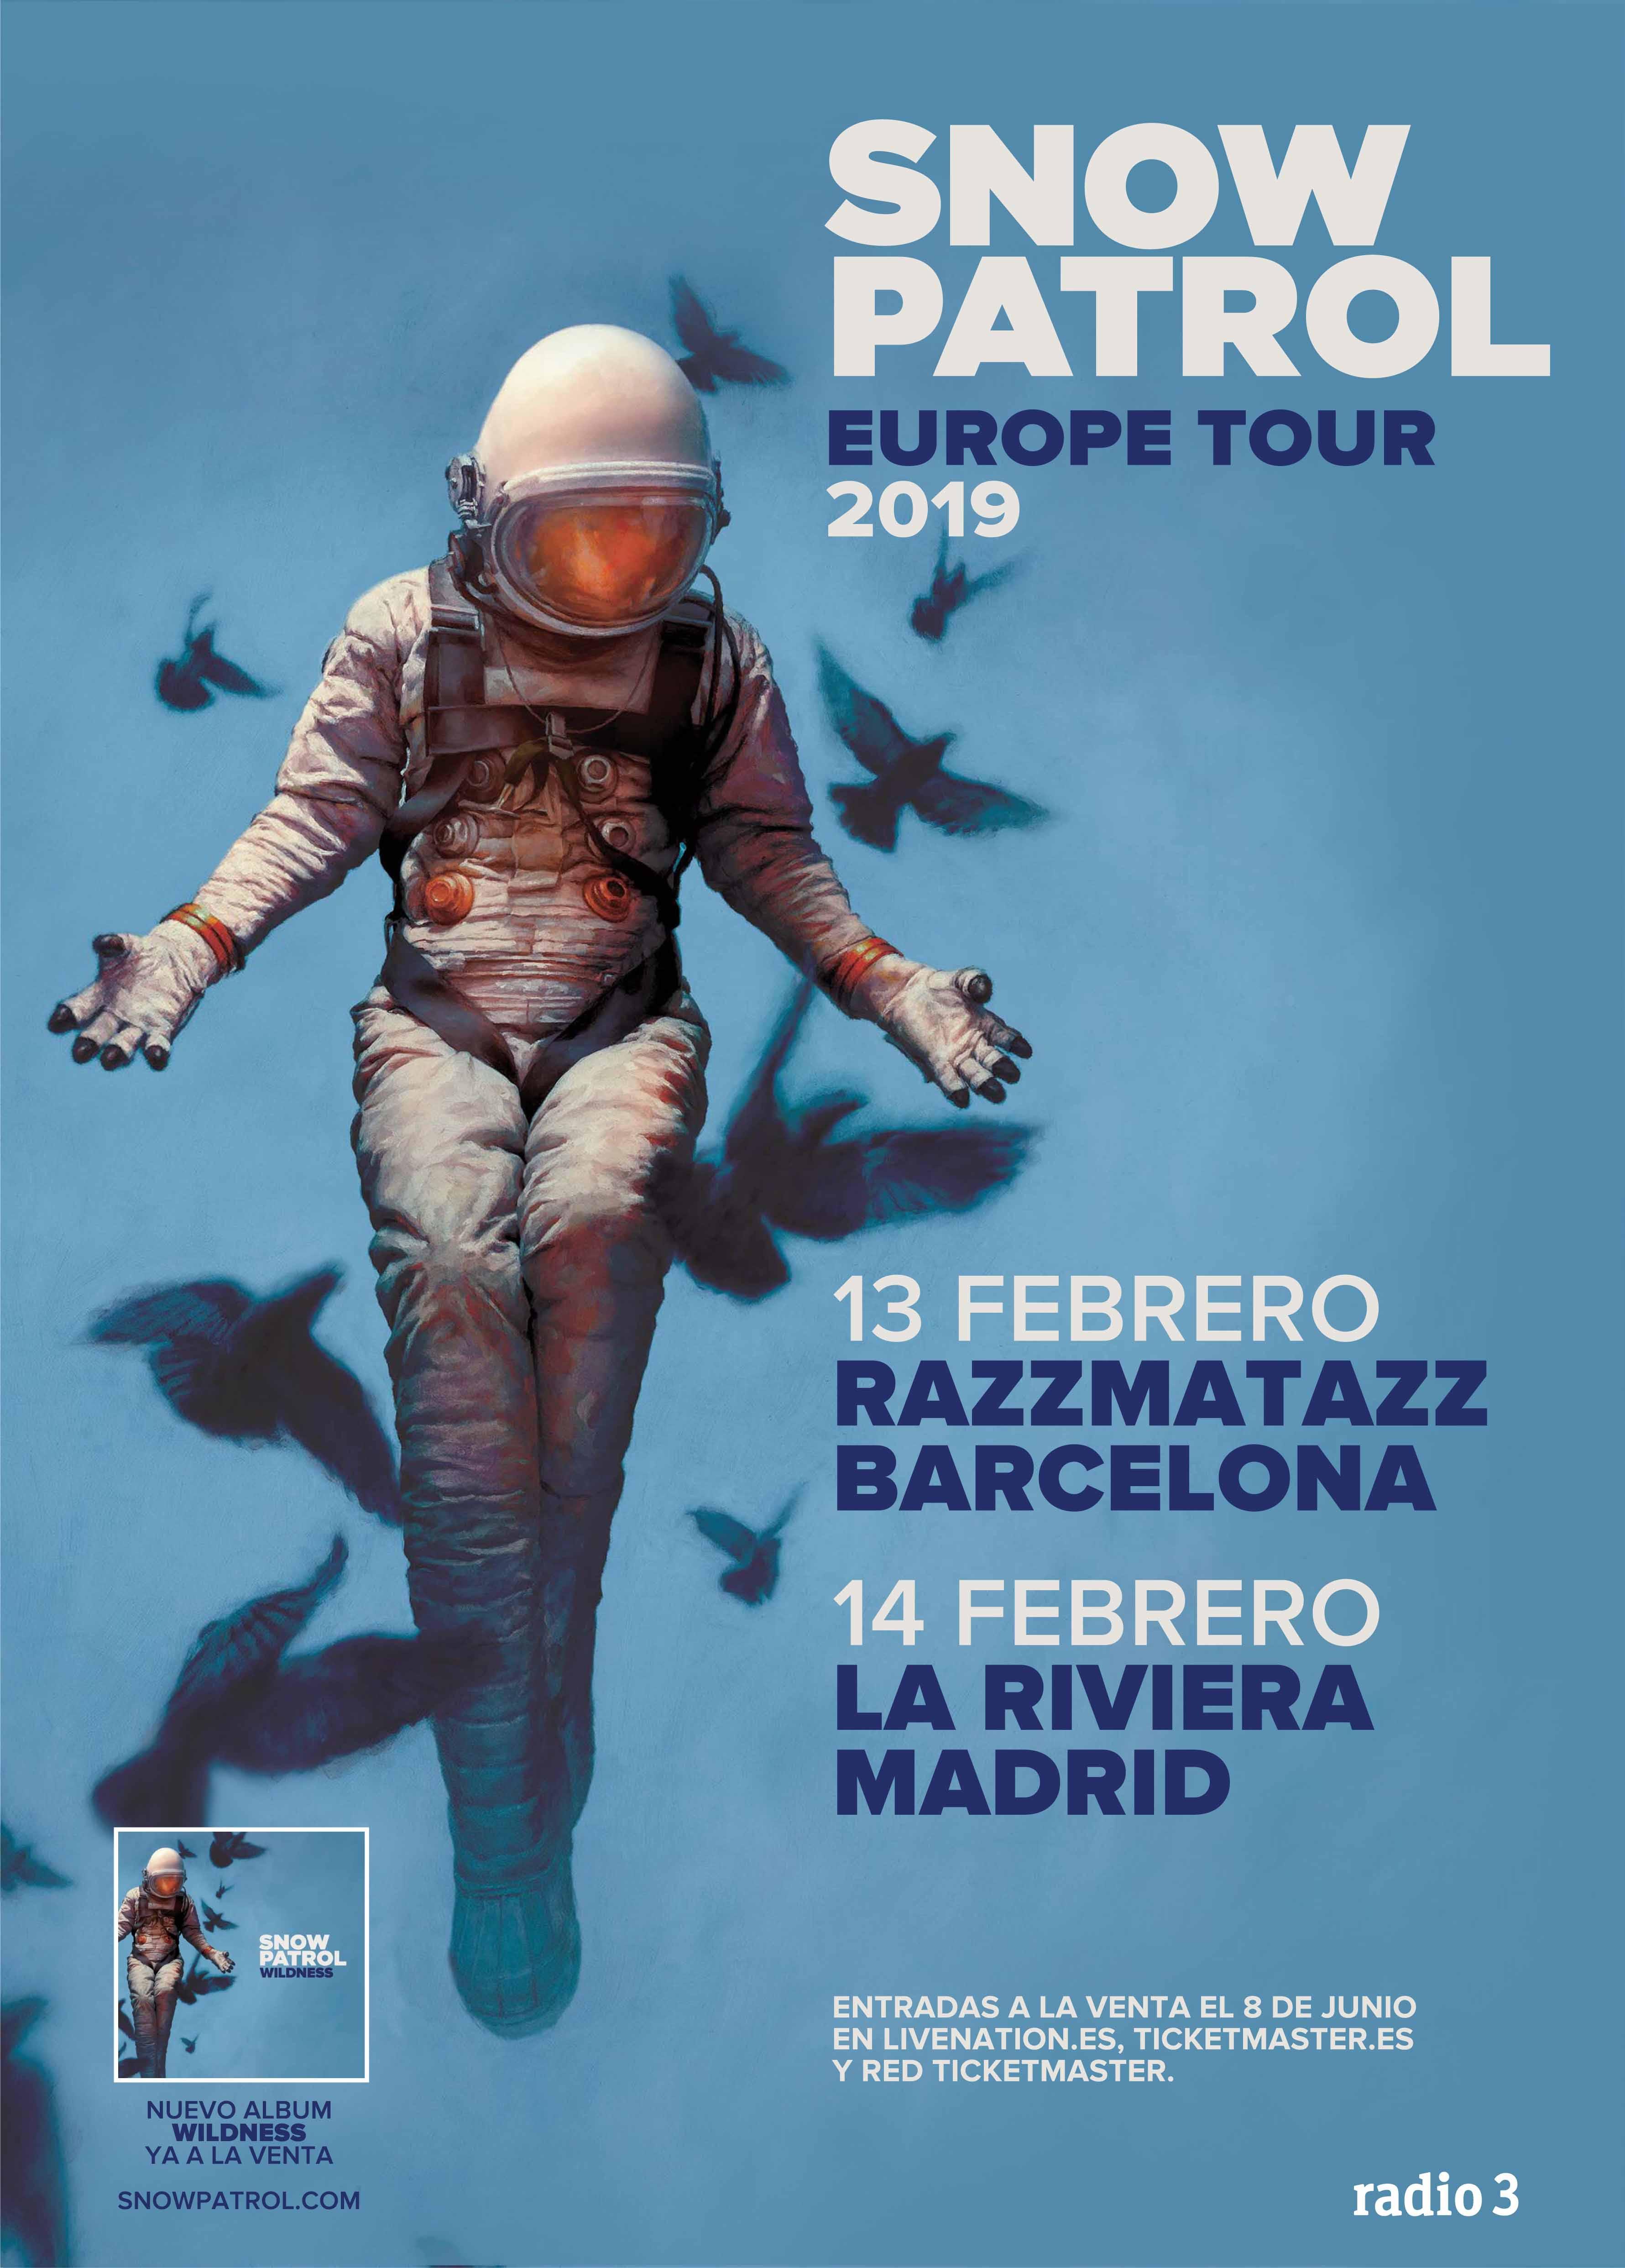 SnowPatrol2019_tour_madridbarcelona.jpg